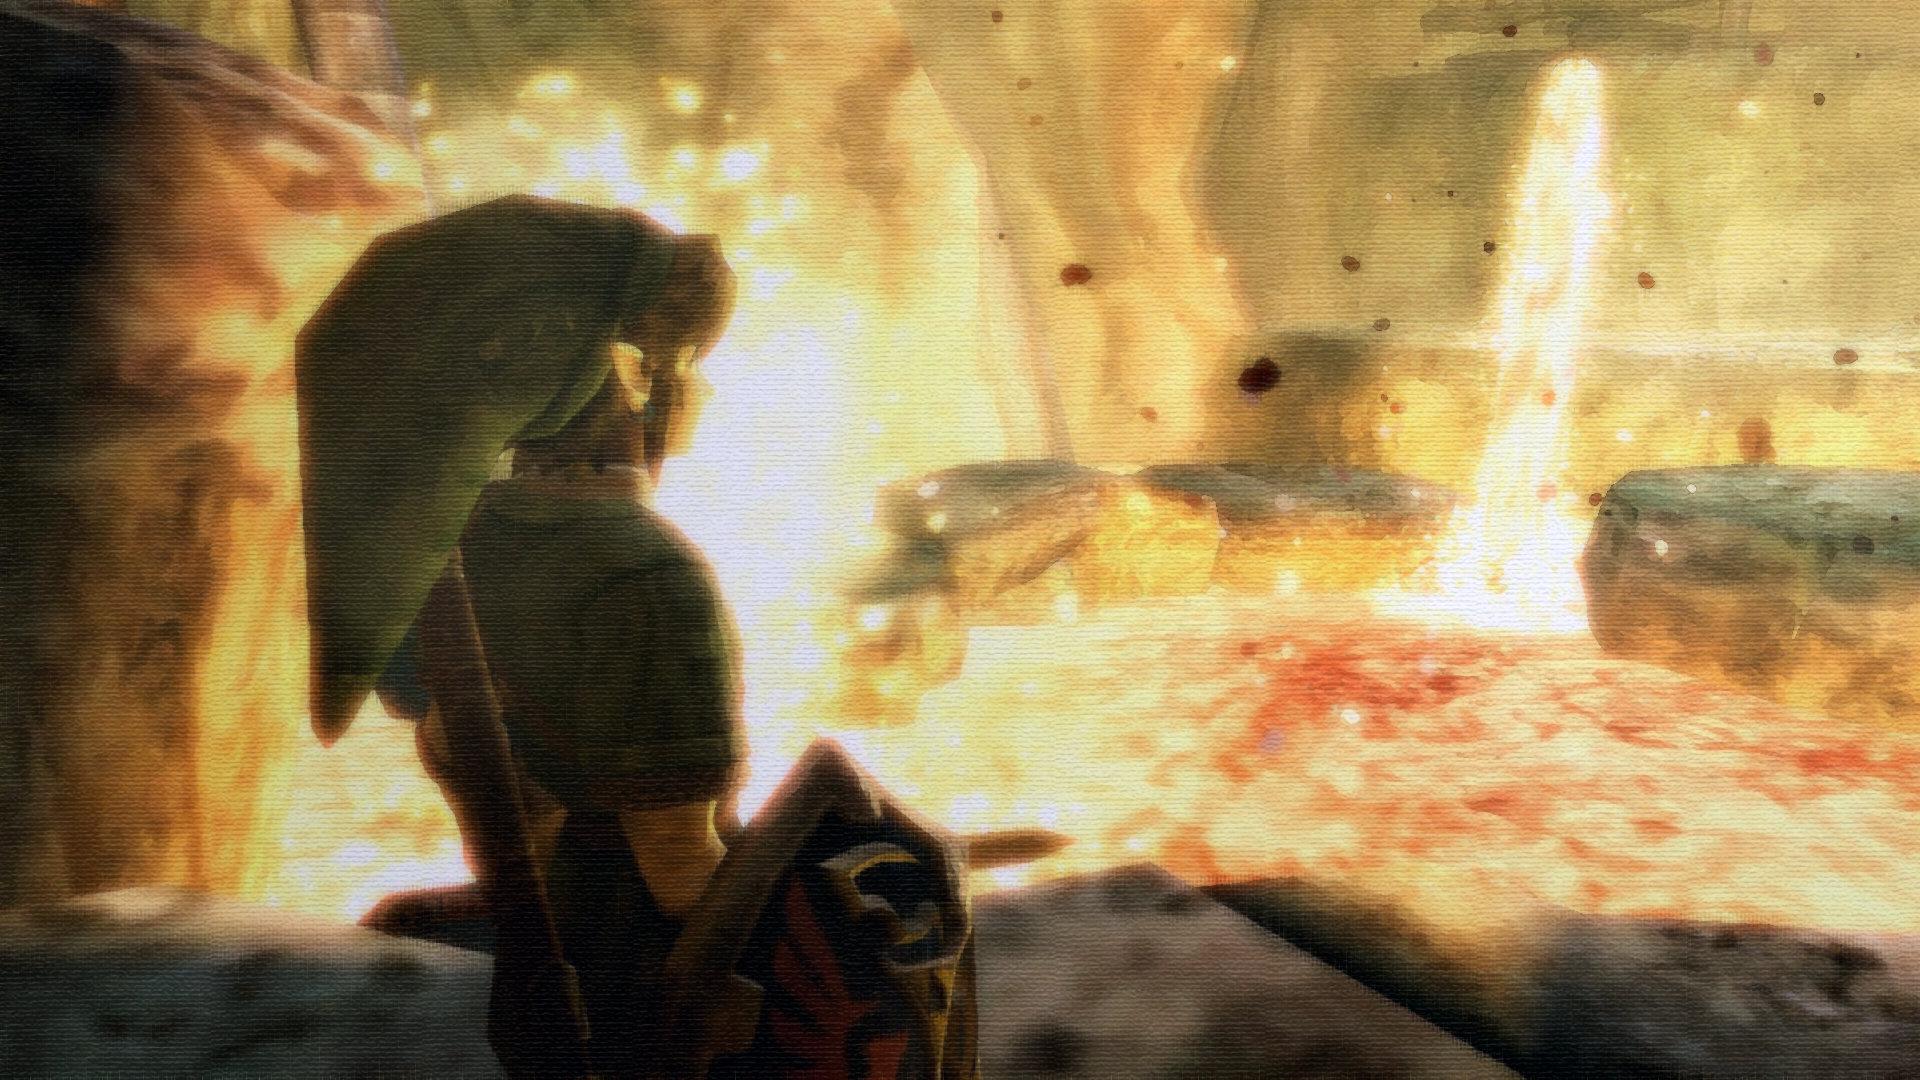 Download Full Hd The Legend Of Zelda Ocarina Of Time Computer